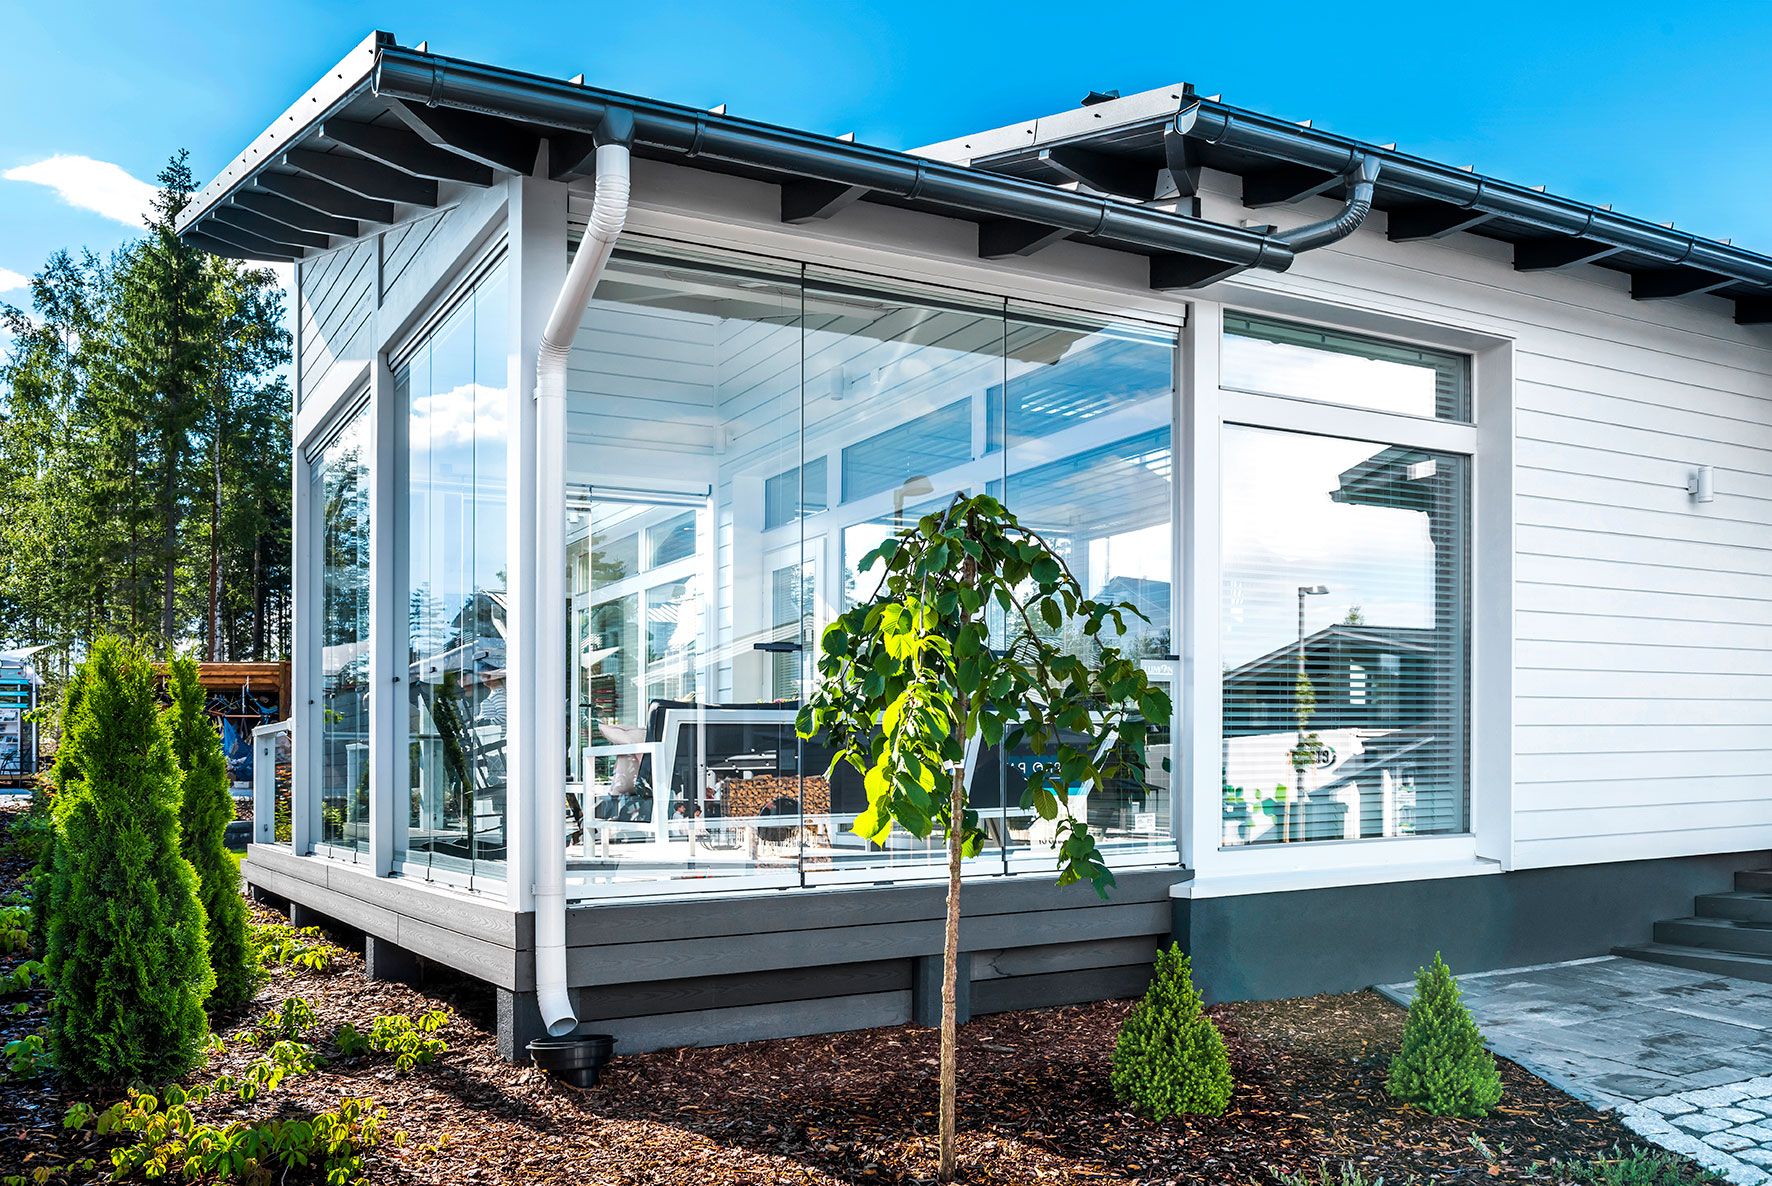 aluminiospisa-cerramientos-trabajar-casa